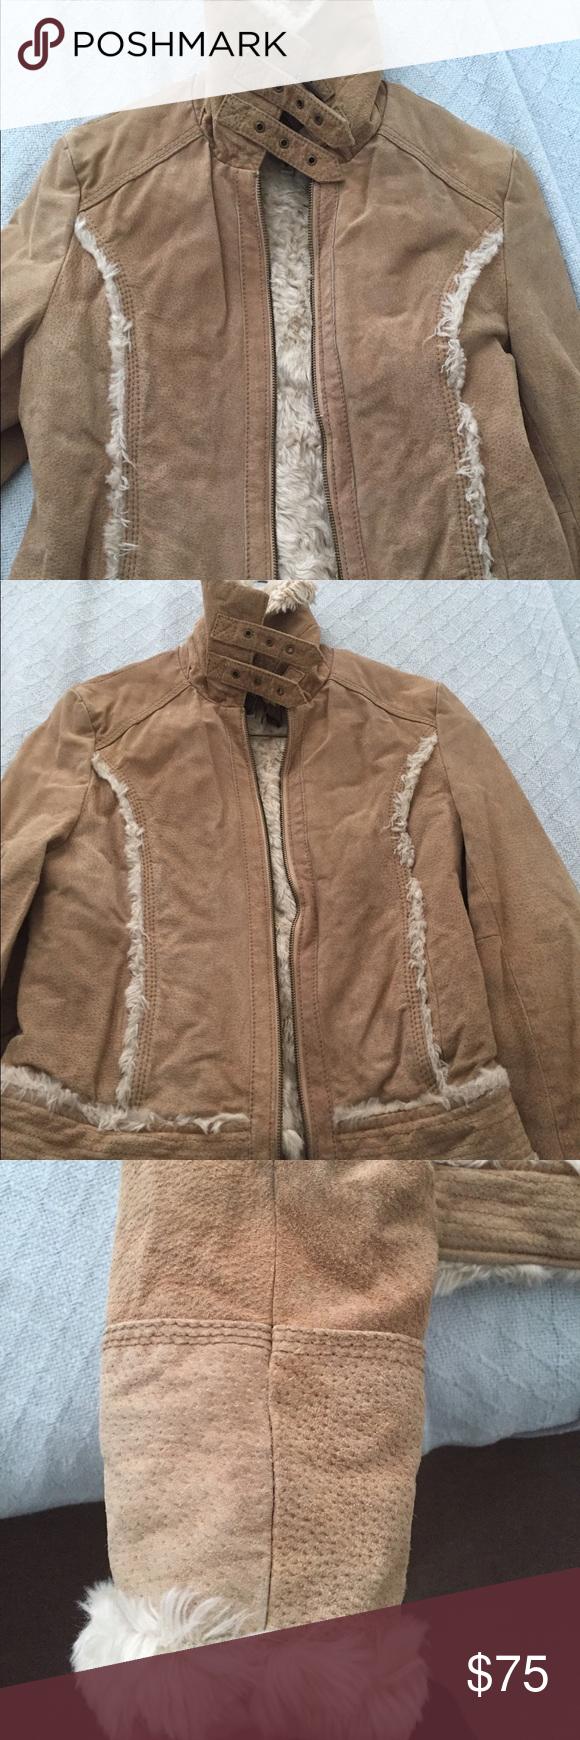 Wilson Leather suede fur lined women's jacket Size S pre